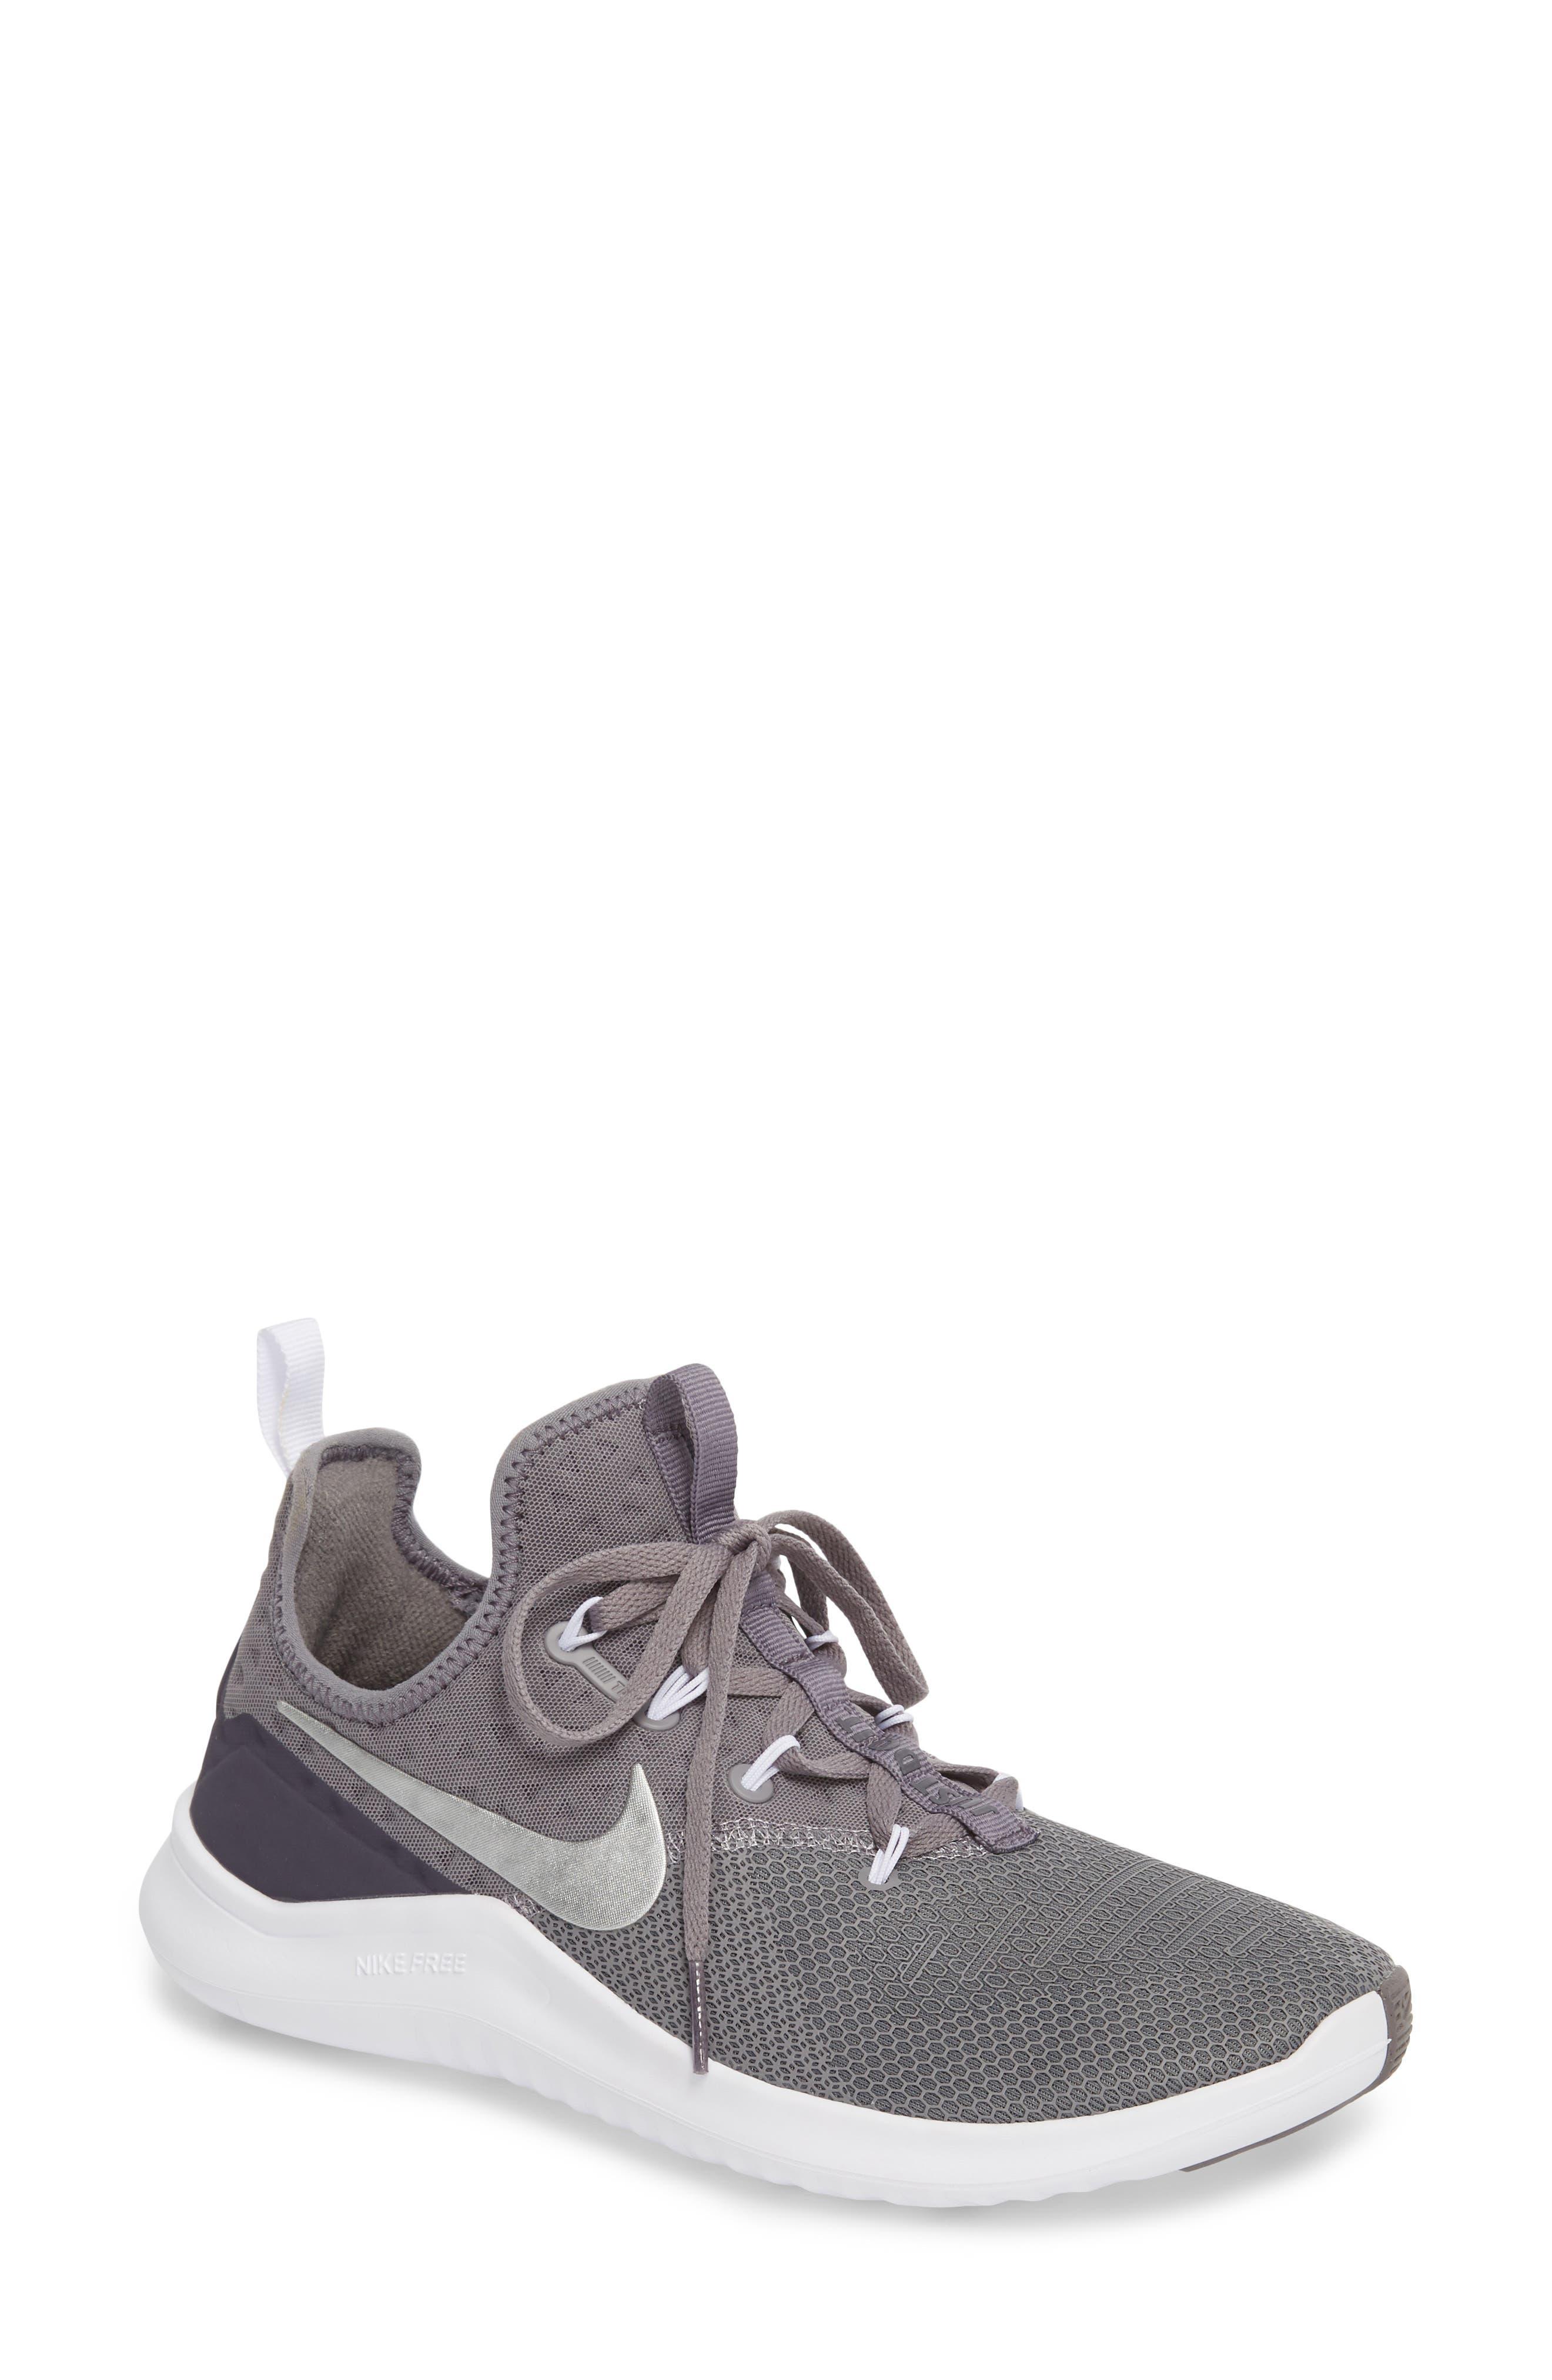 NIKE Free TR8 Training Shoe, Main, color, GUNSMOKE/ METALLIC SILVER